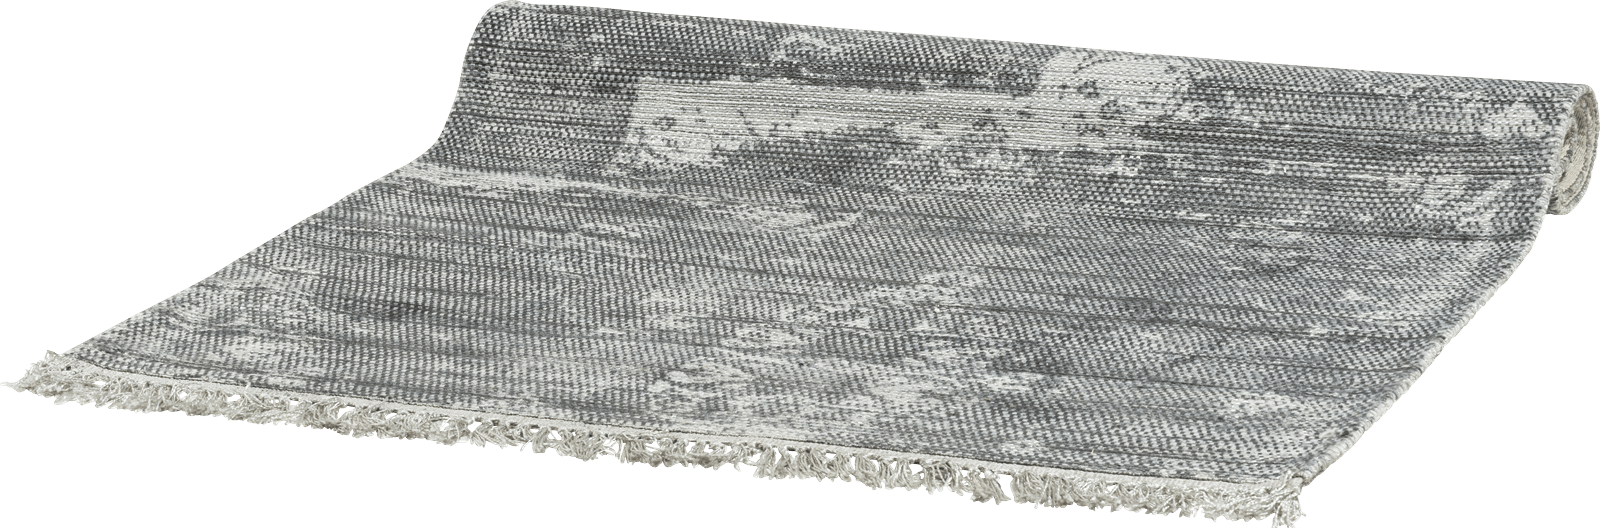 XOOON - Coco Maison - sydney carpet 160x230cm